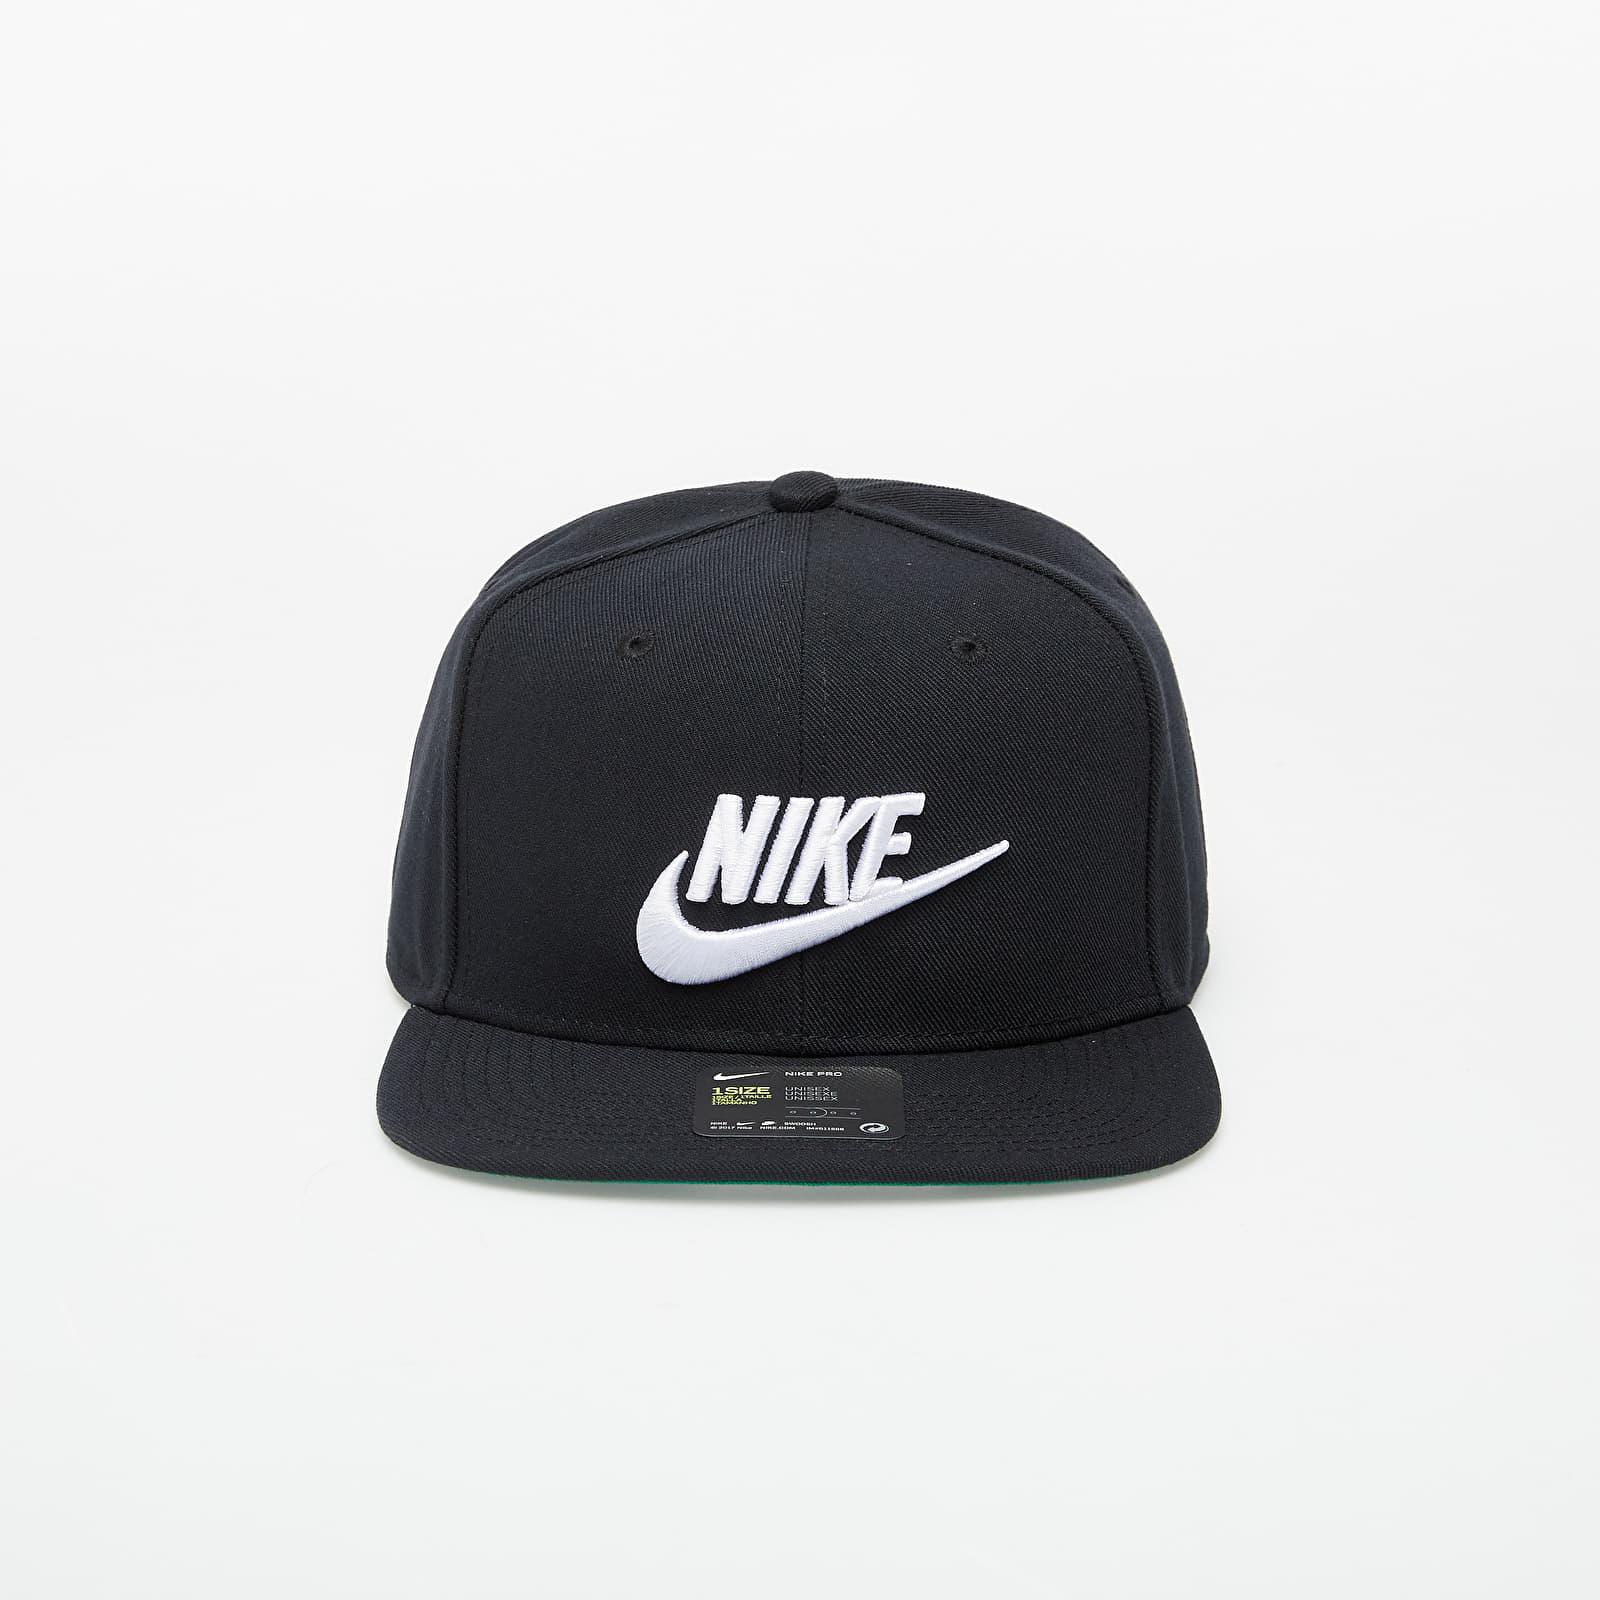 Caps Nike Sportswear Futura Pro Cap Black/ White